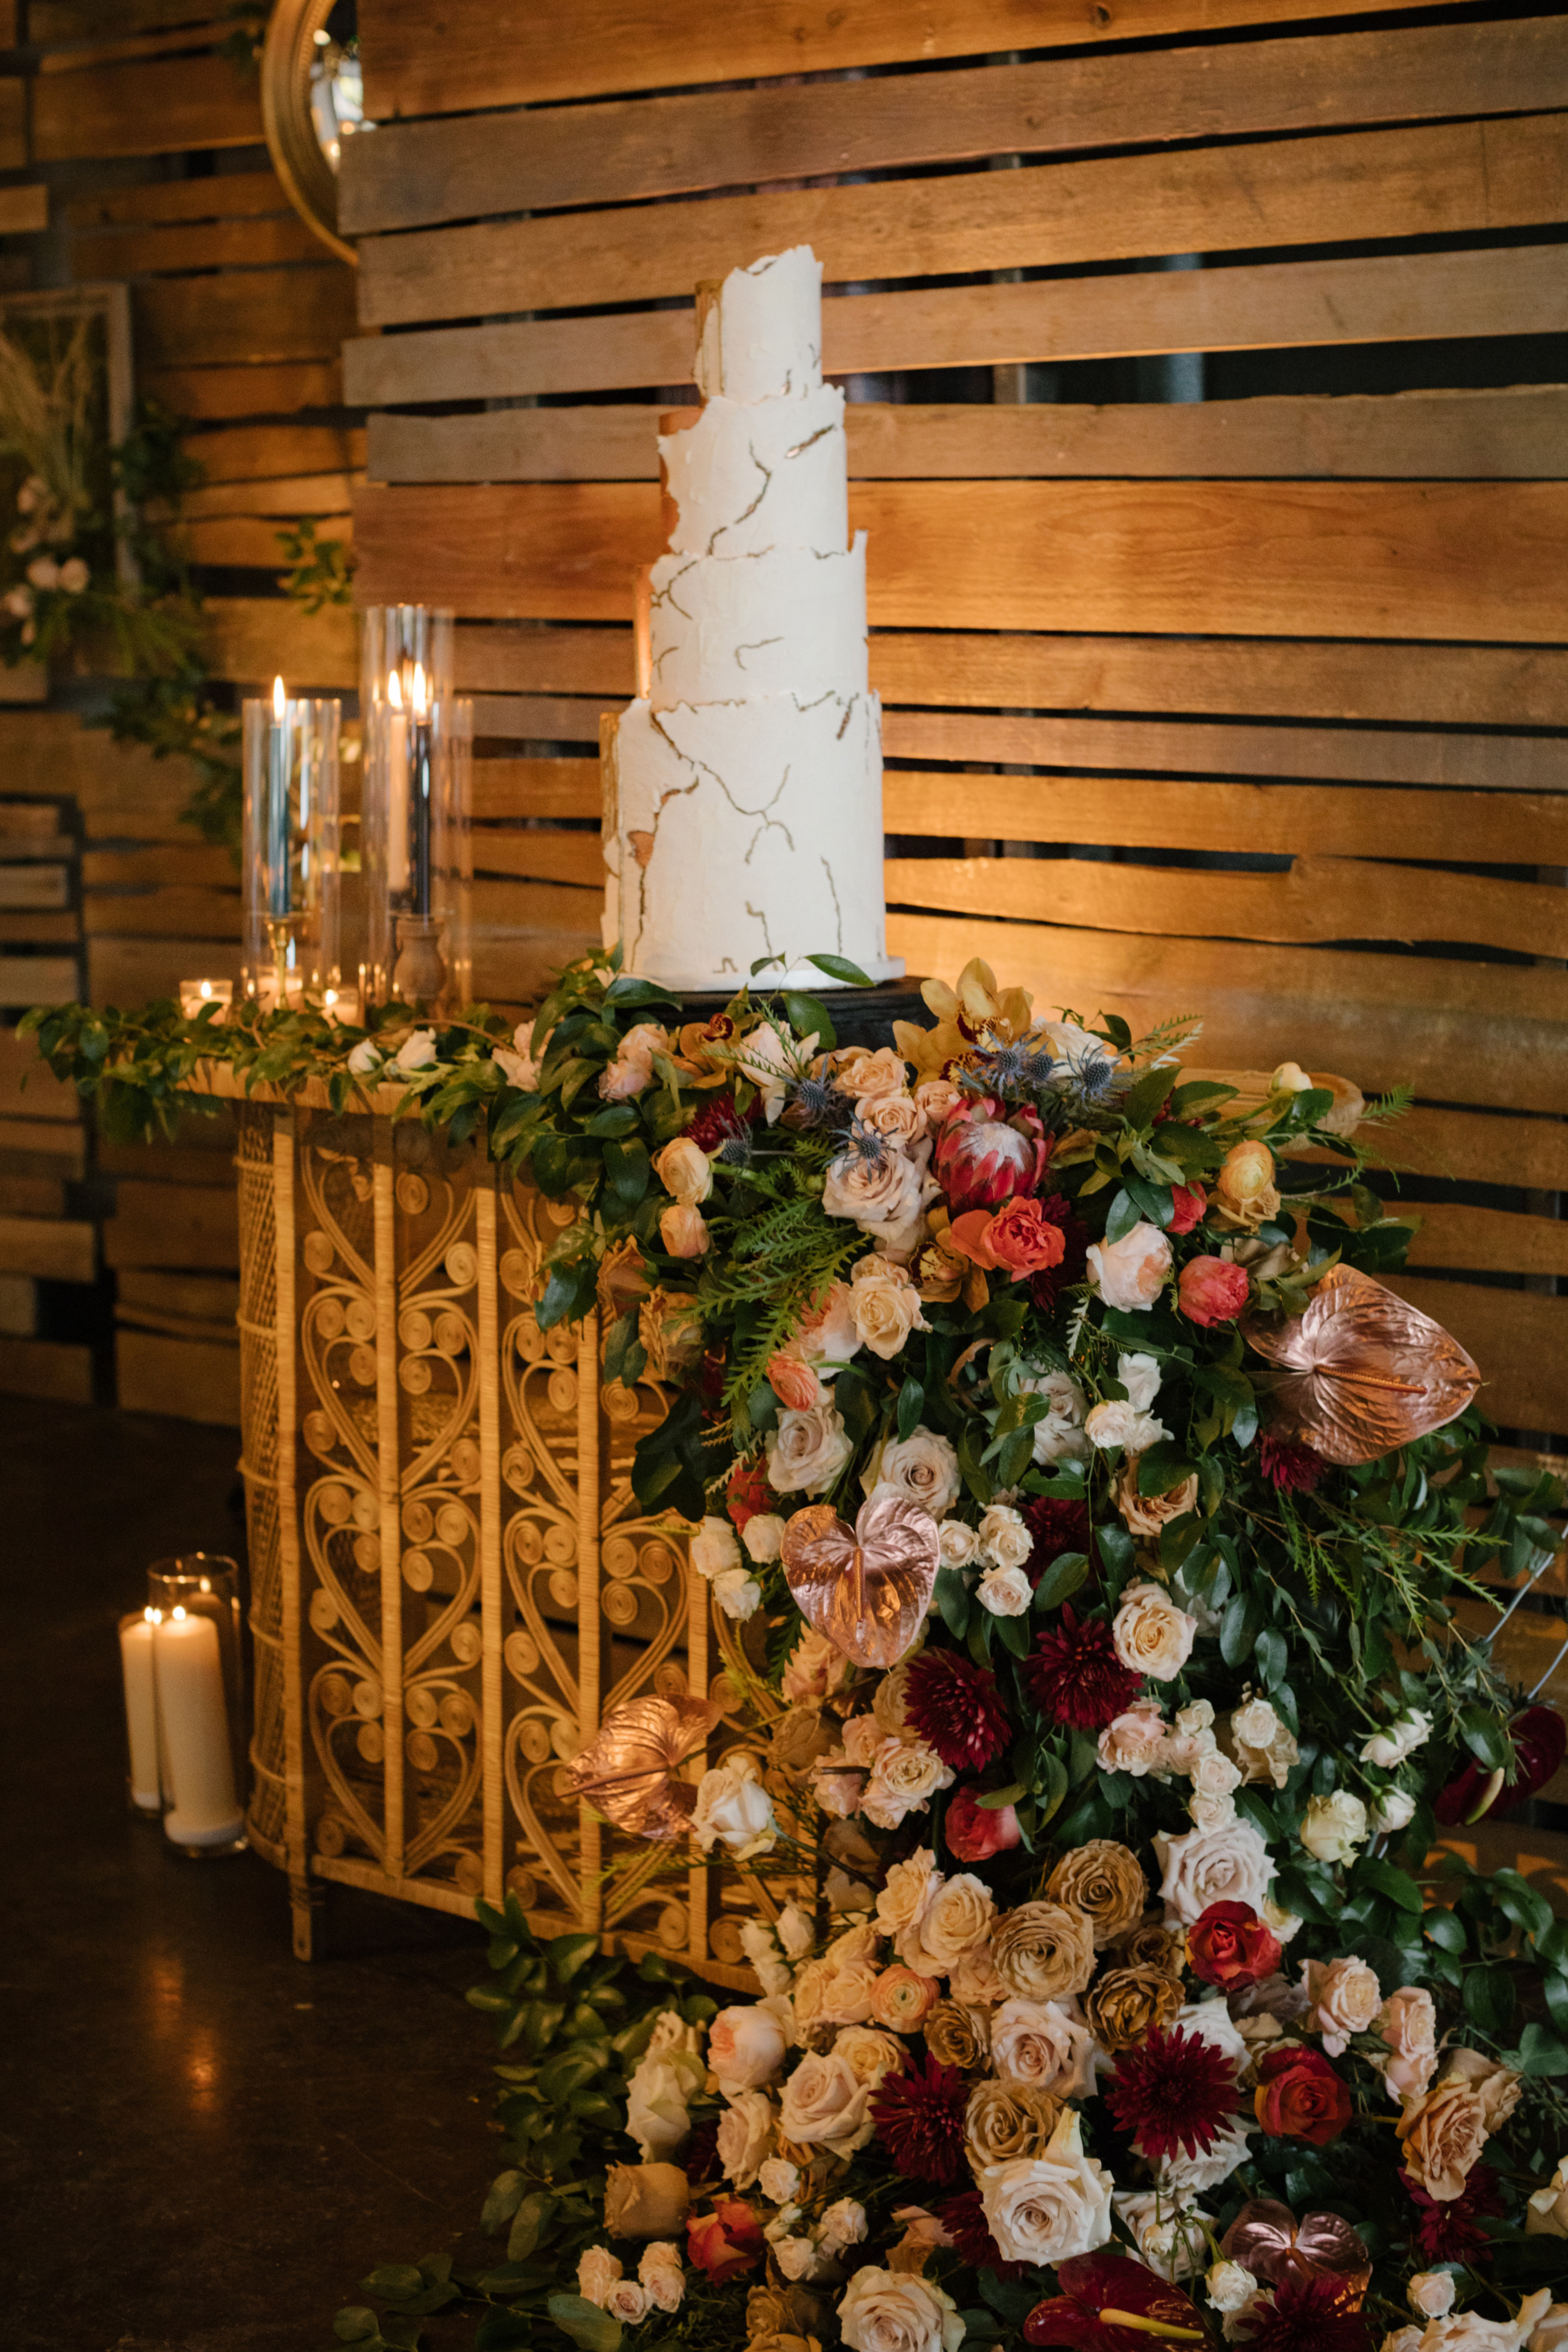 Luxurious wedding cake display